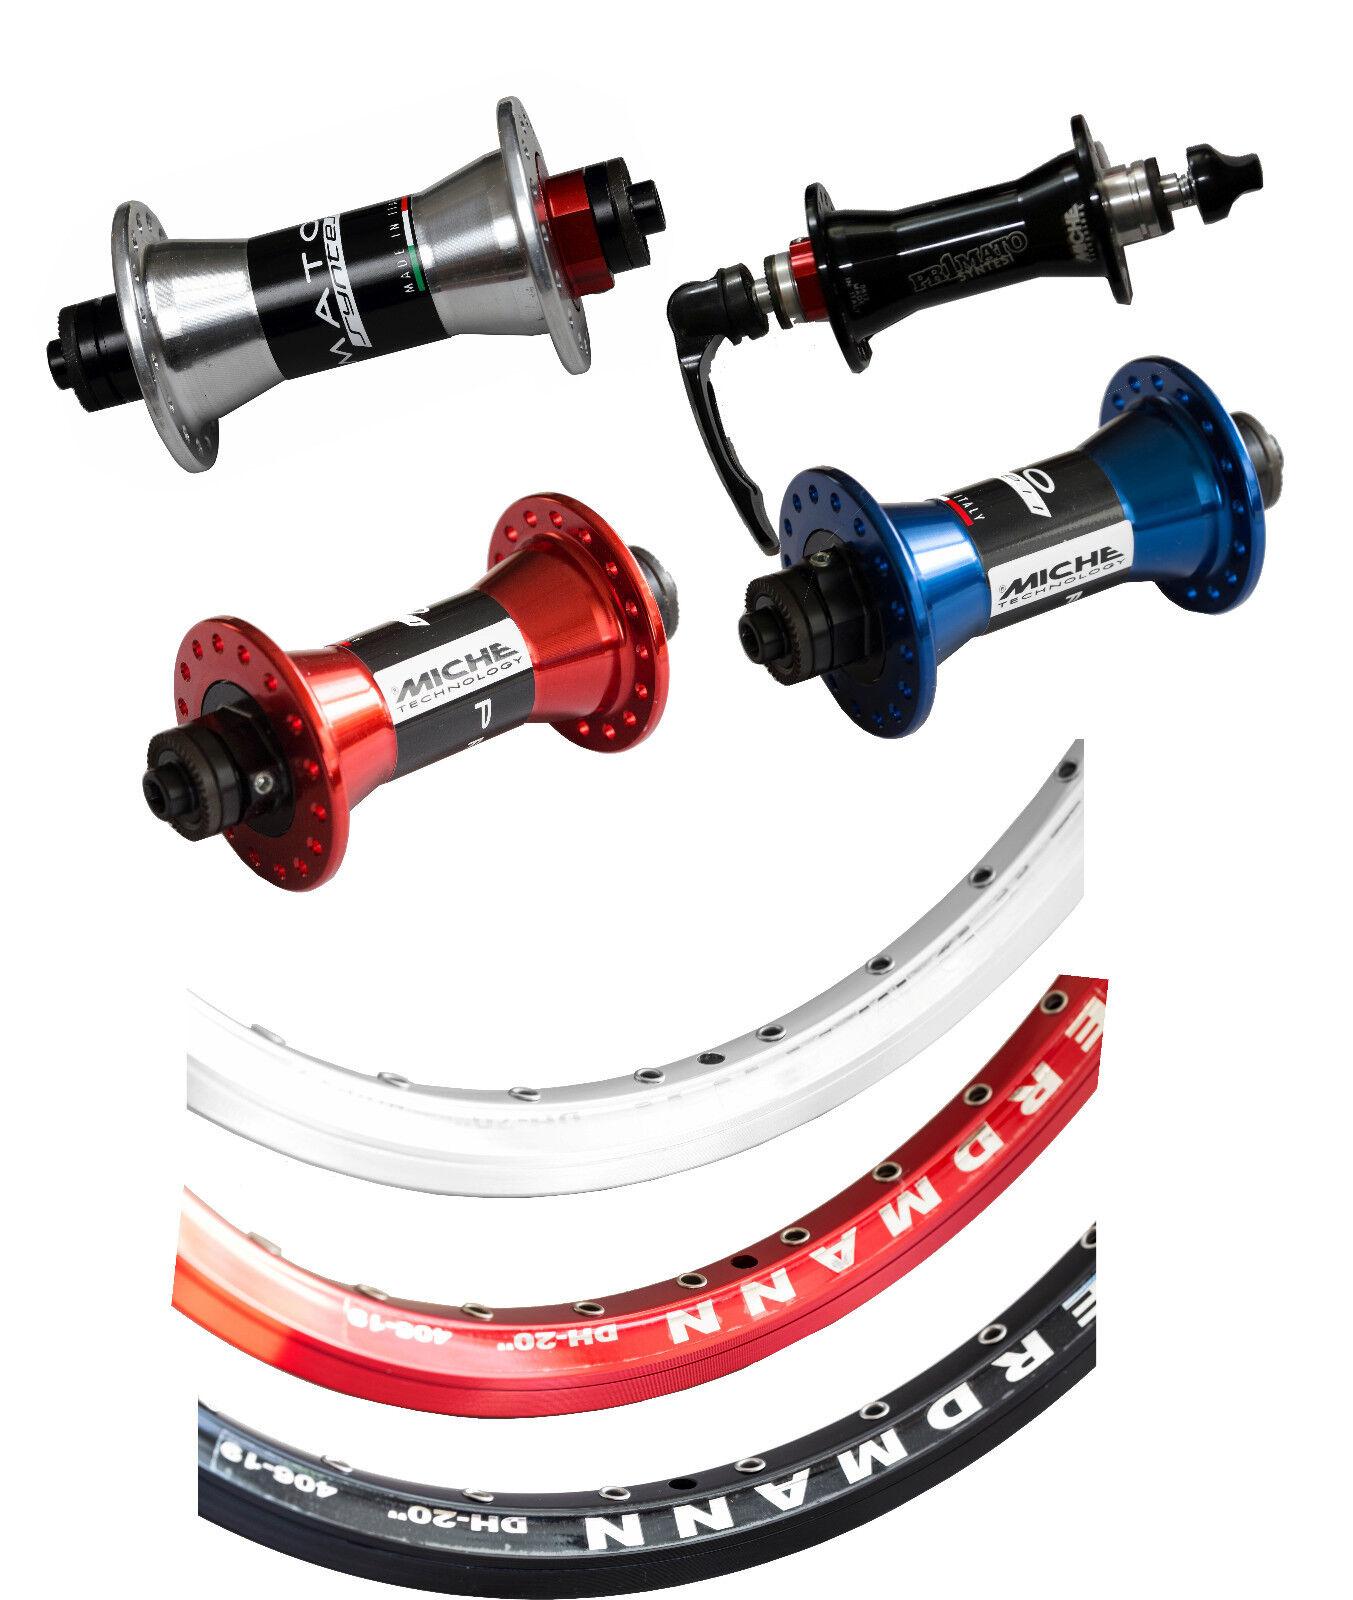 20 Inch Front Wheel Hub Miche Primato Syntesi Rim Erdmann Dh-20